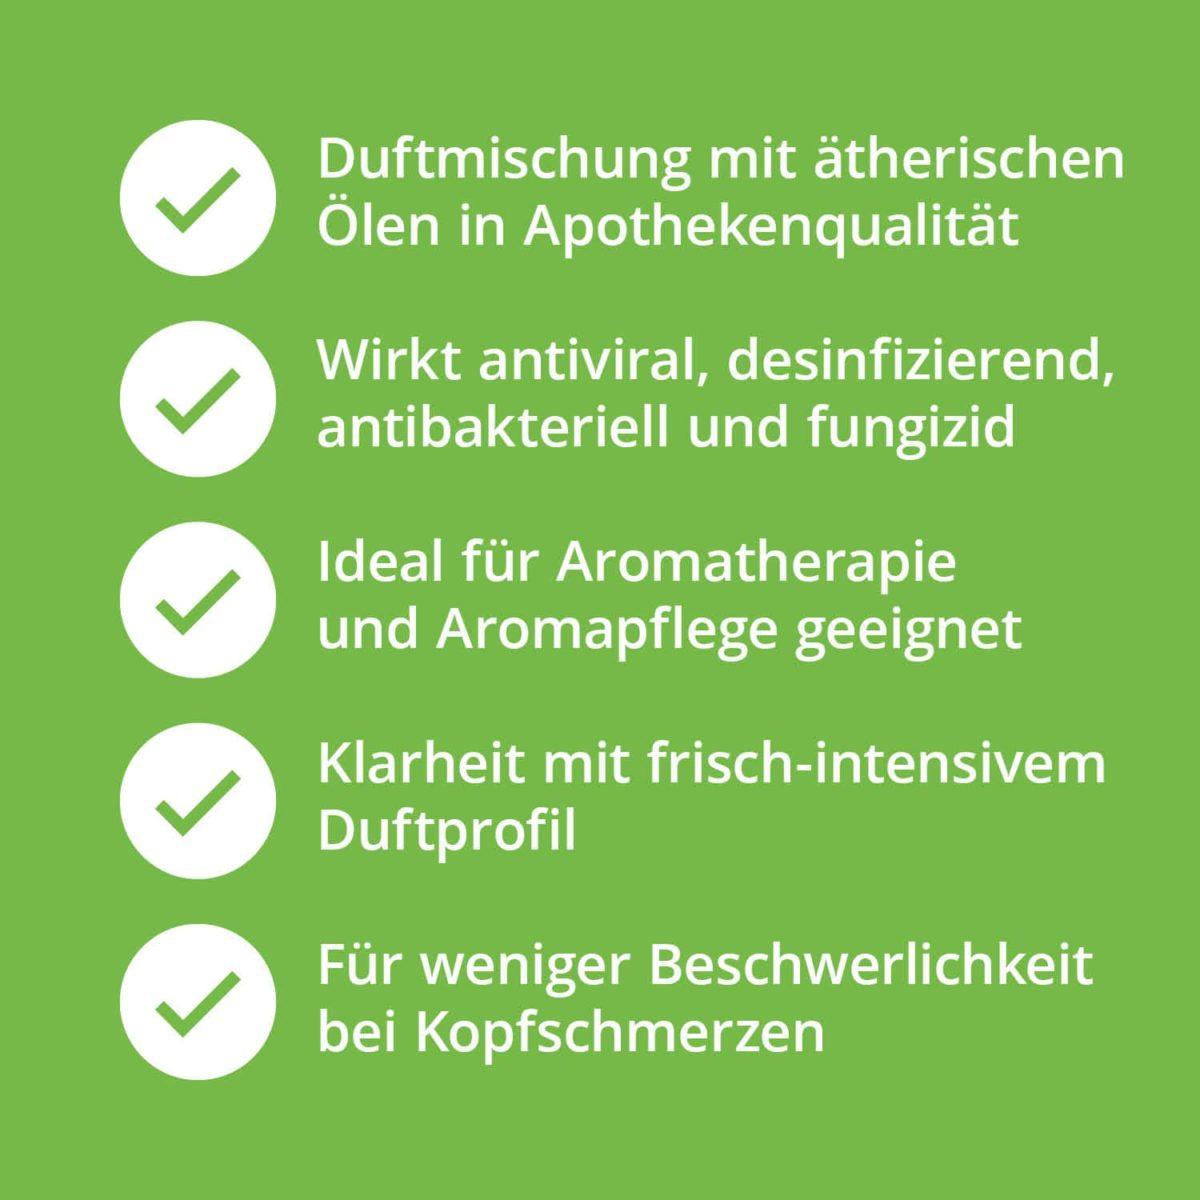 Casida Duftmischung Befreiter Kopf - 5 ml 17394523 PZN Apotheke Kopfschmerzen Aromatherapie Aromapflege Aromaschmuck Diffuser7